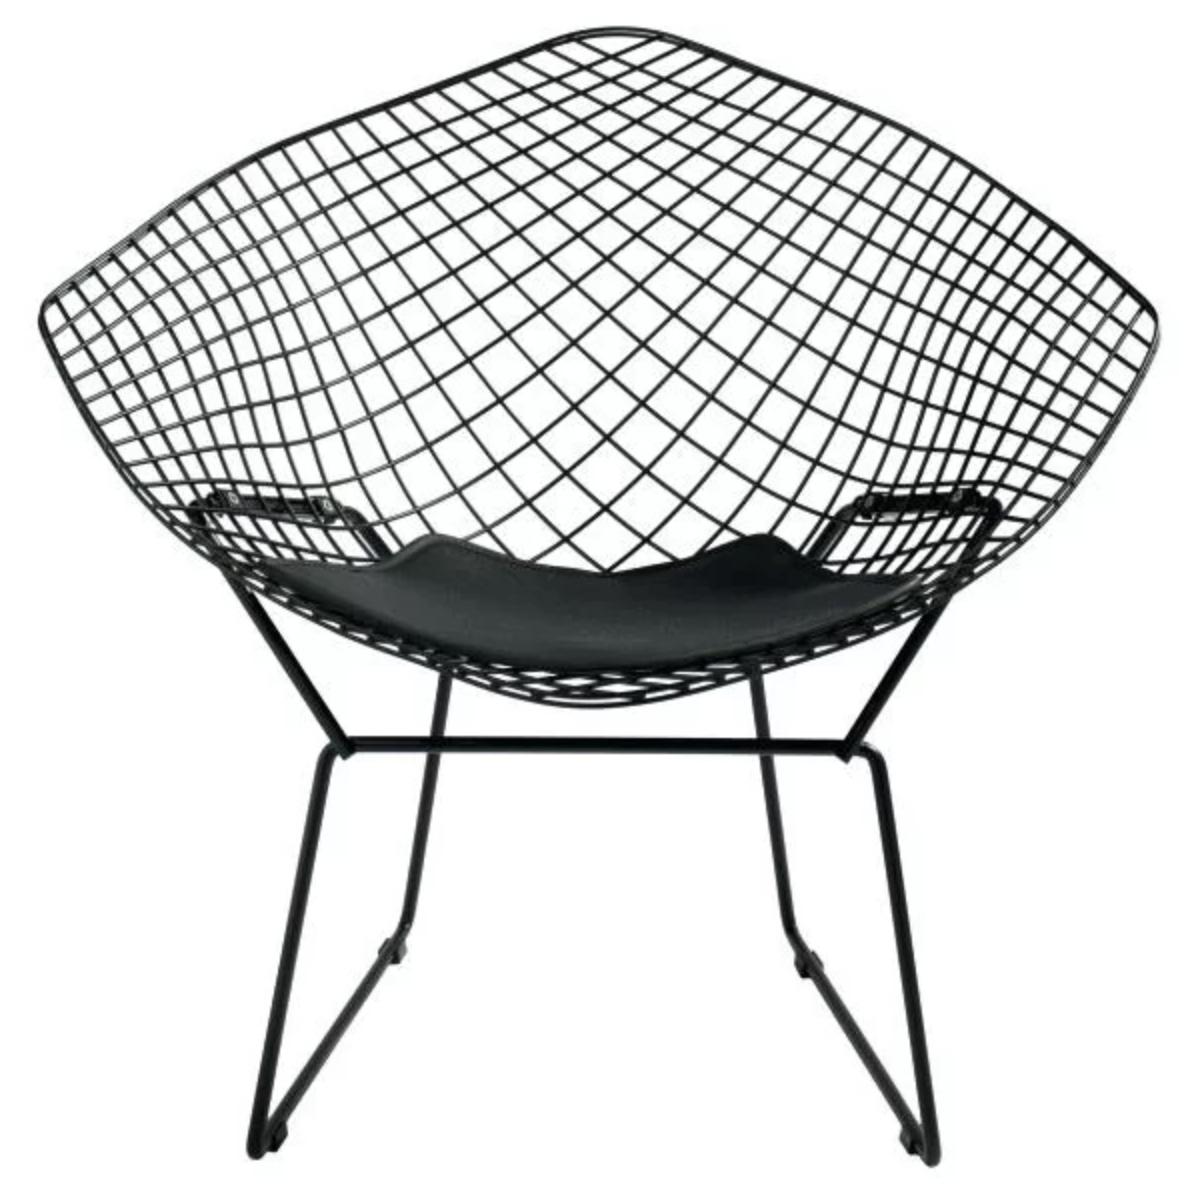 Black Metal Wire Onion Creek Papasan Chair Accent Chair Roundup | Modern, Industrial, Rustic, Beach, Boho Accent and Arm Chairs | Miranda Schroeder Blog